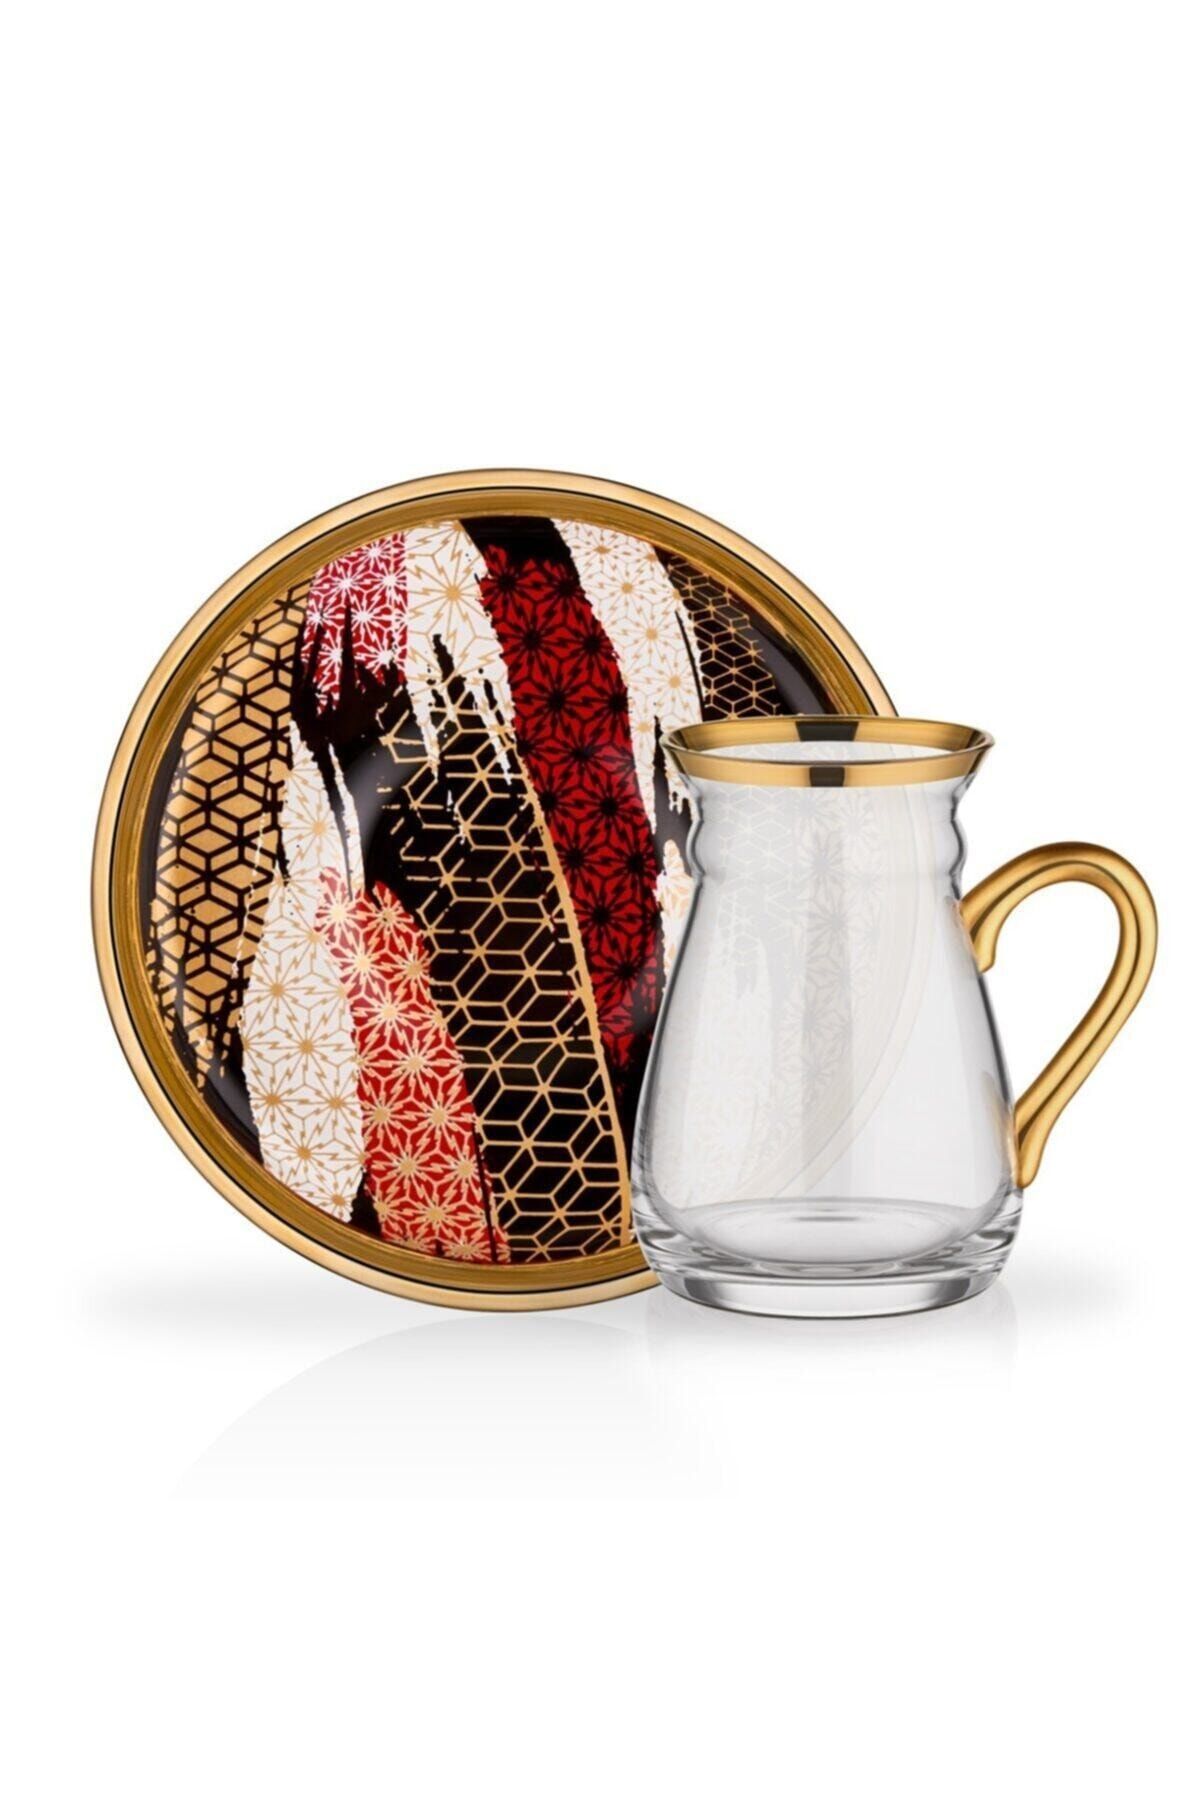 Glore Nihavent 12 Parça Kulplu Çay Bardağı Seti Mixed 1